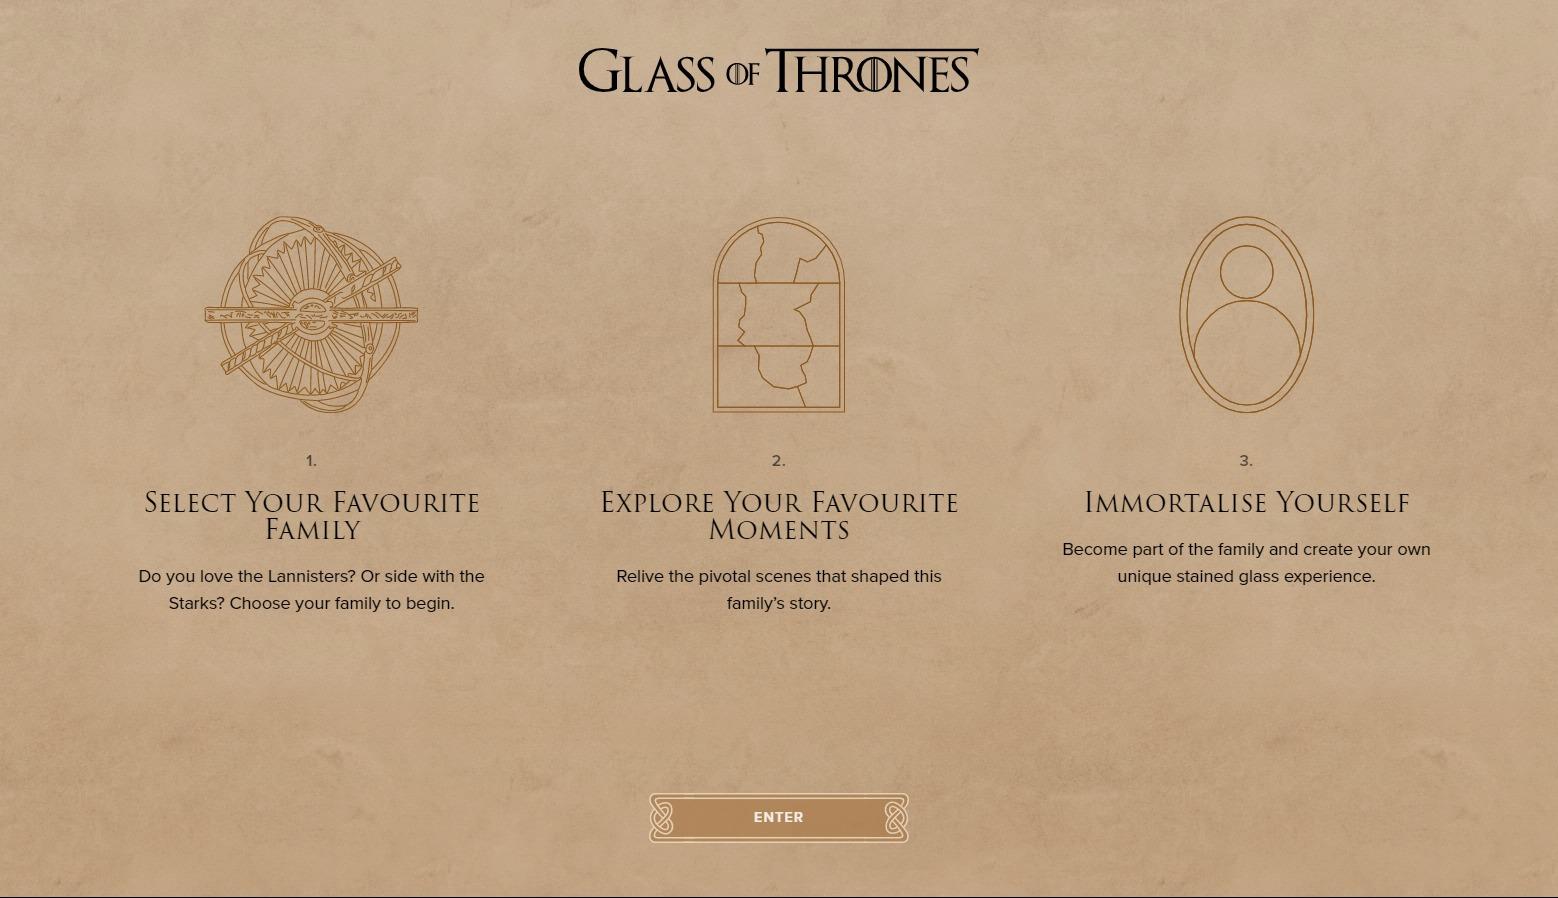 Glass of Thrones